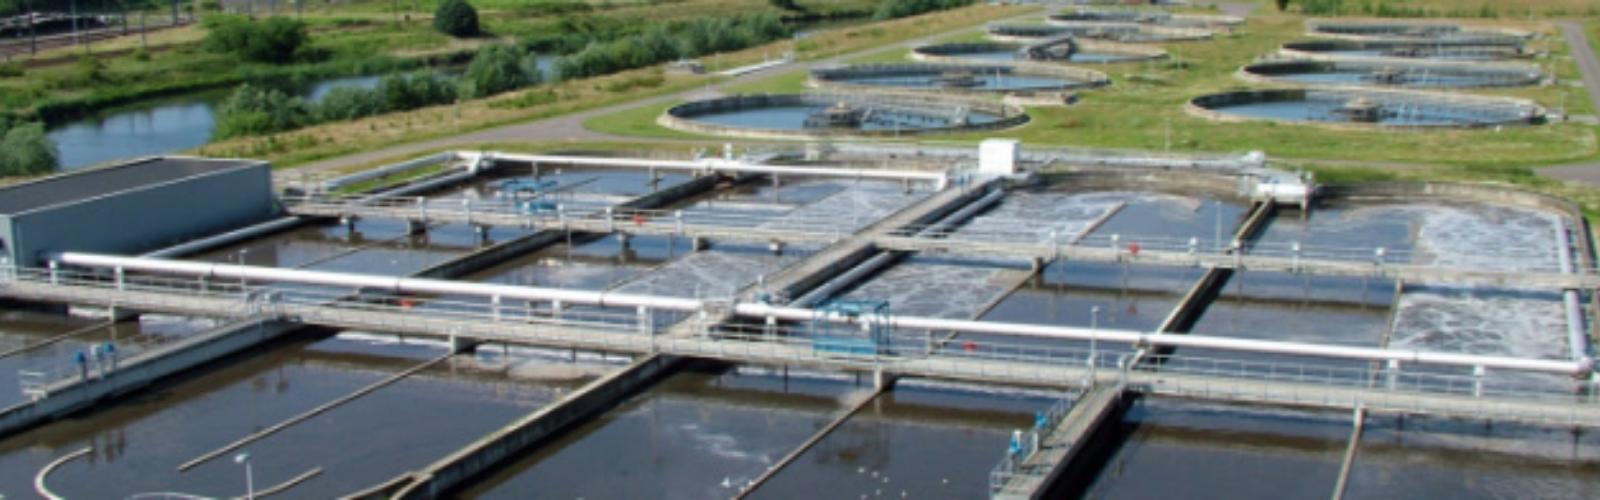 Waterzuiveringsstations en pompstations